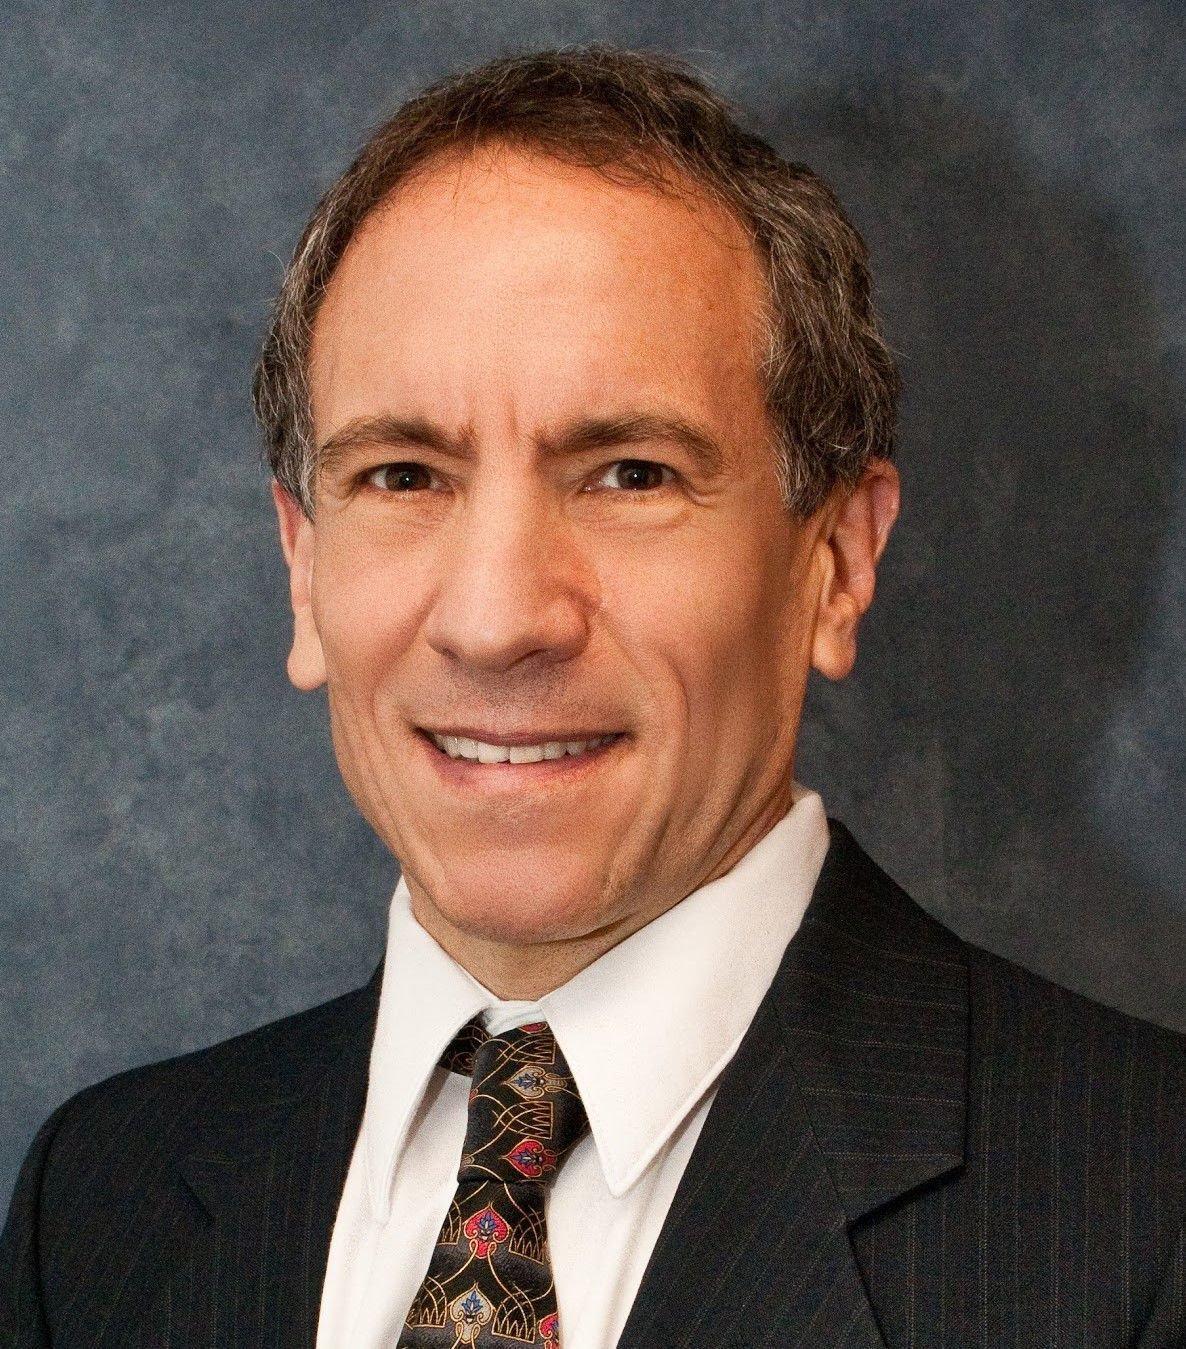 Joseph Gianfortoni Headshot